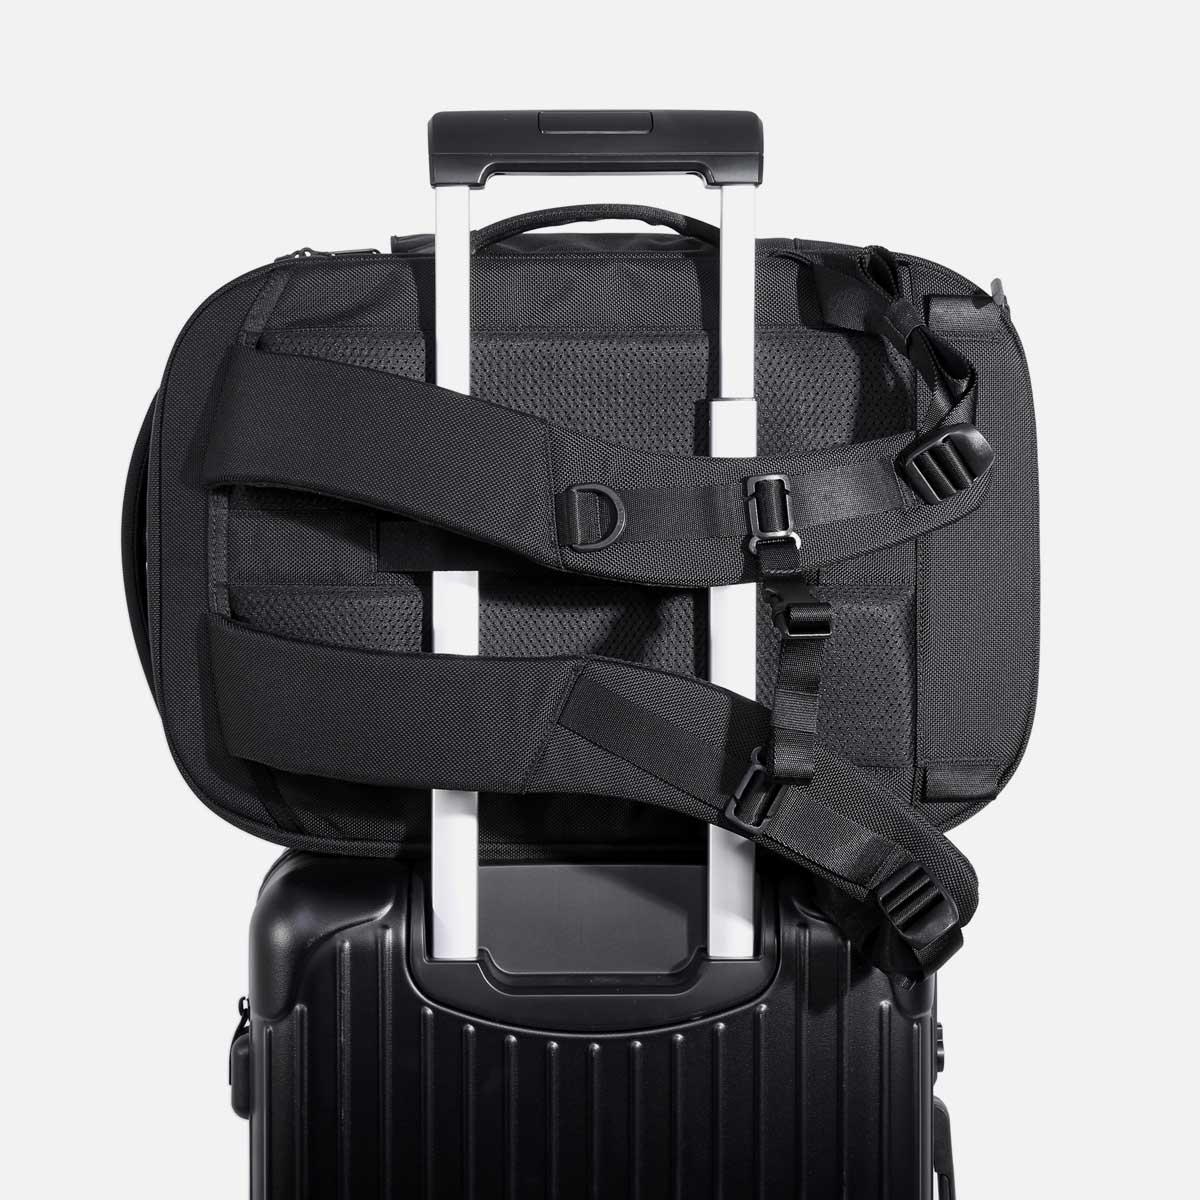 AER21022_travelpack2small_luggage.jpg